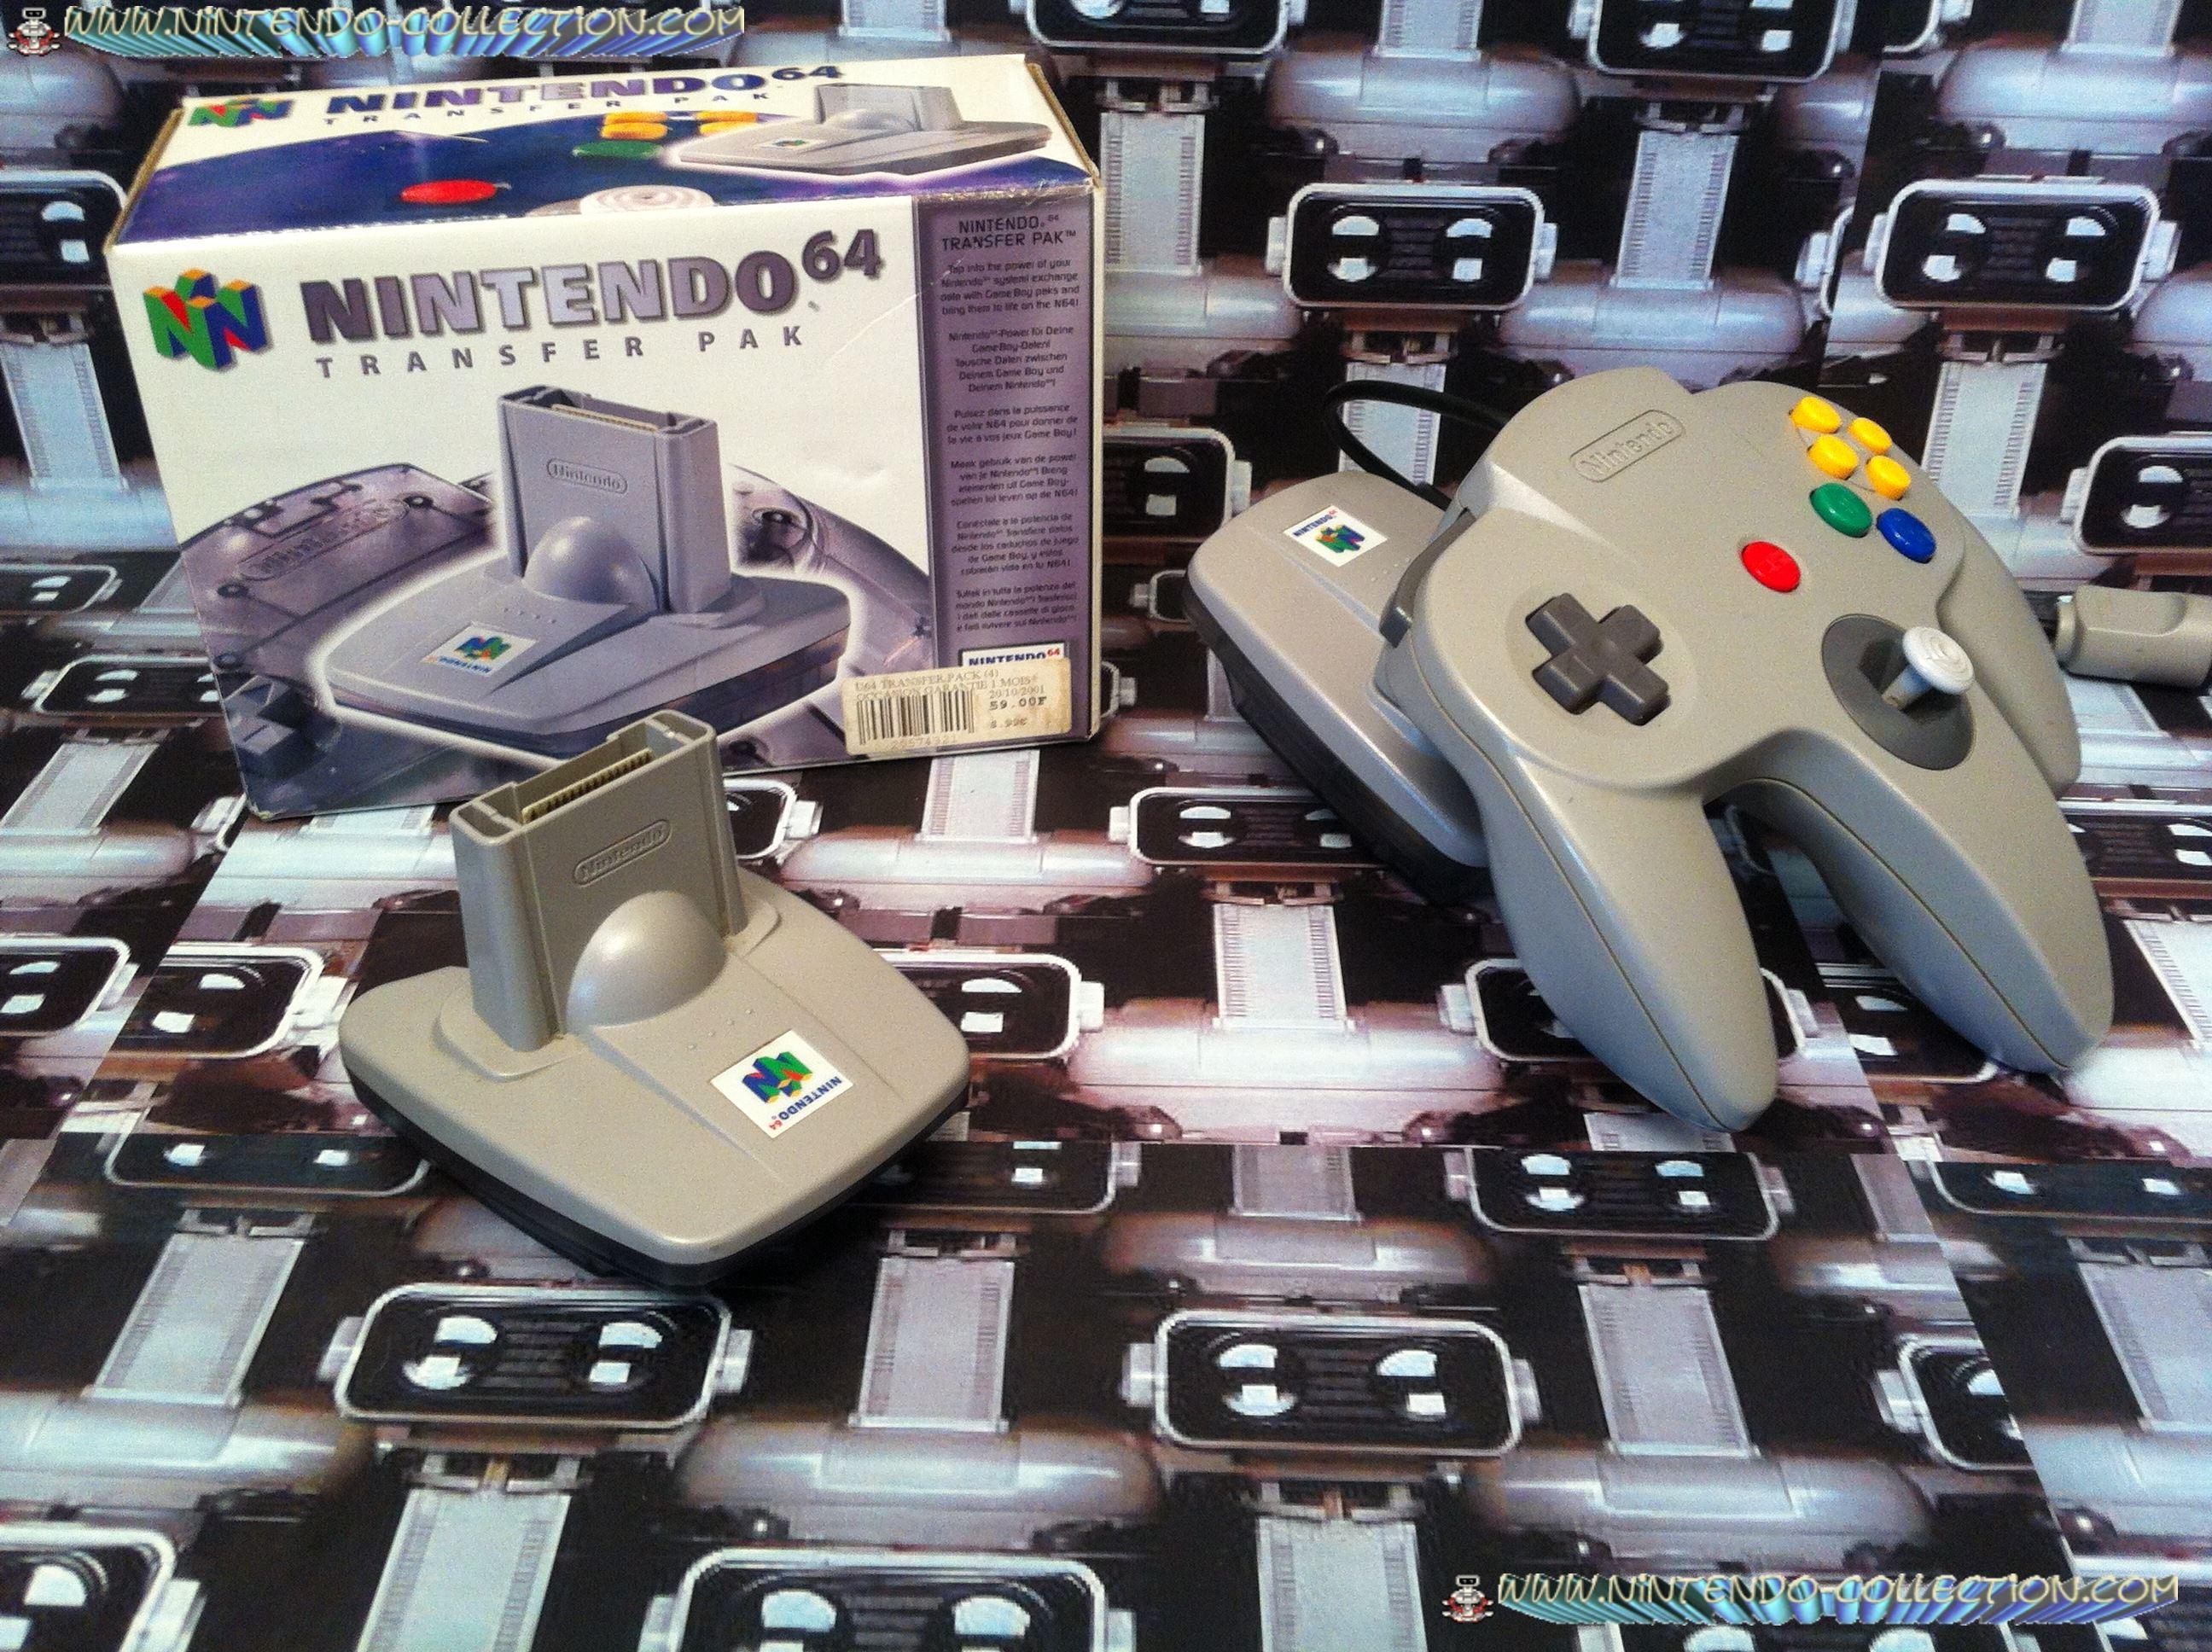 www.nintendo-collection.com - Nintendo 64 N64 Accessory - Accessoire - Transfert Pak